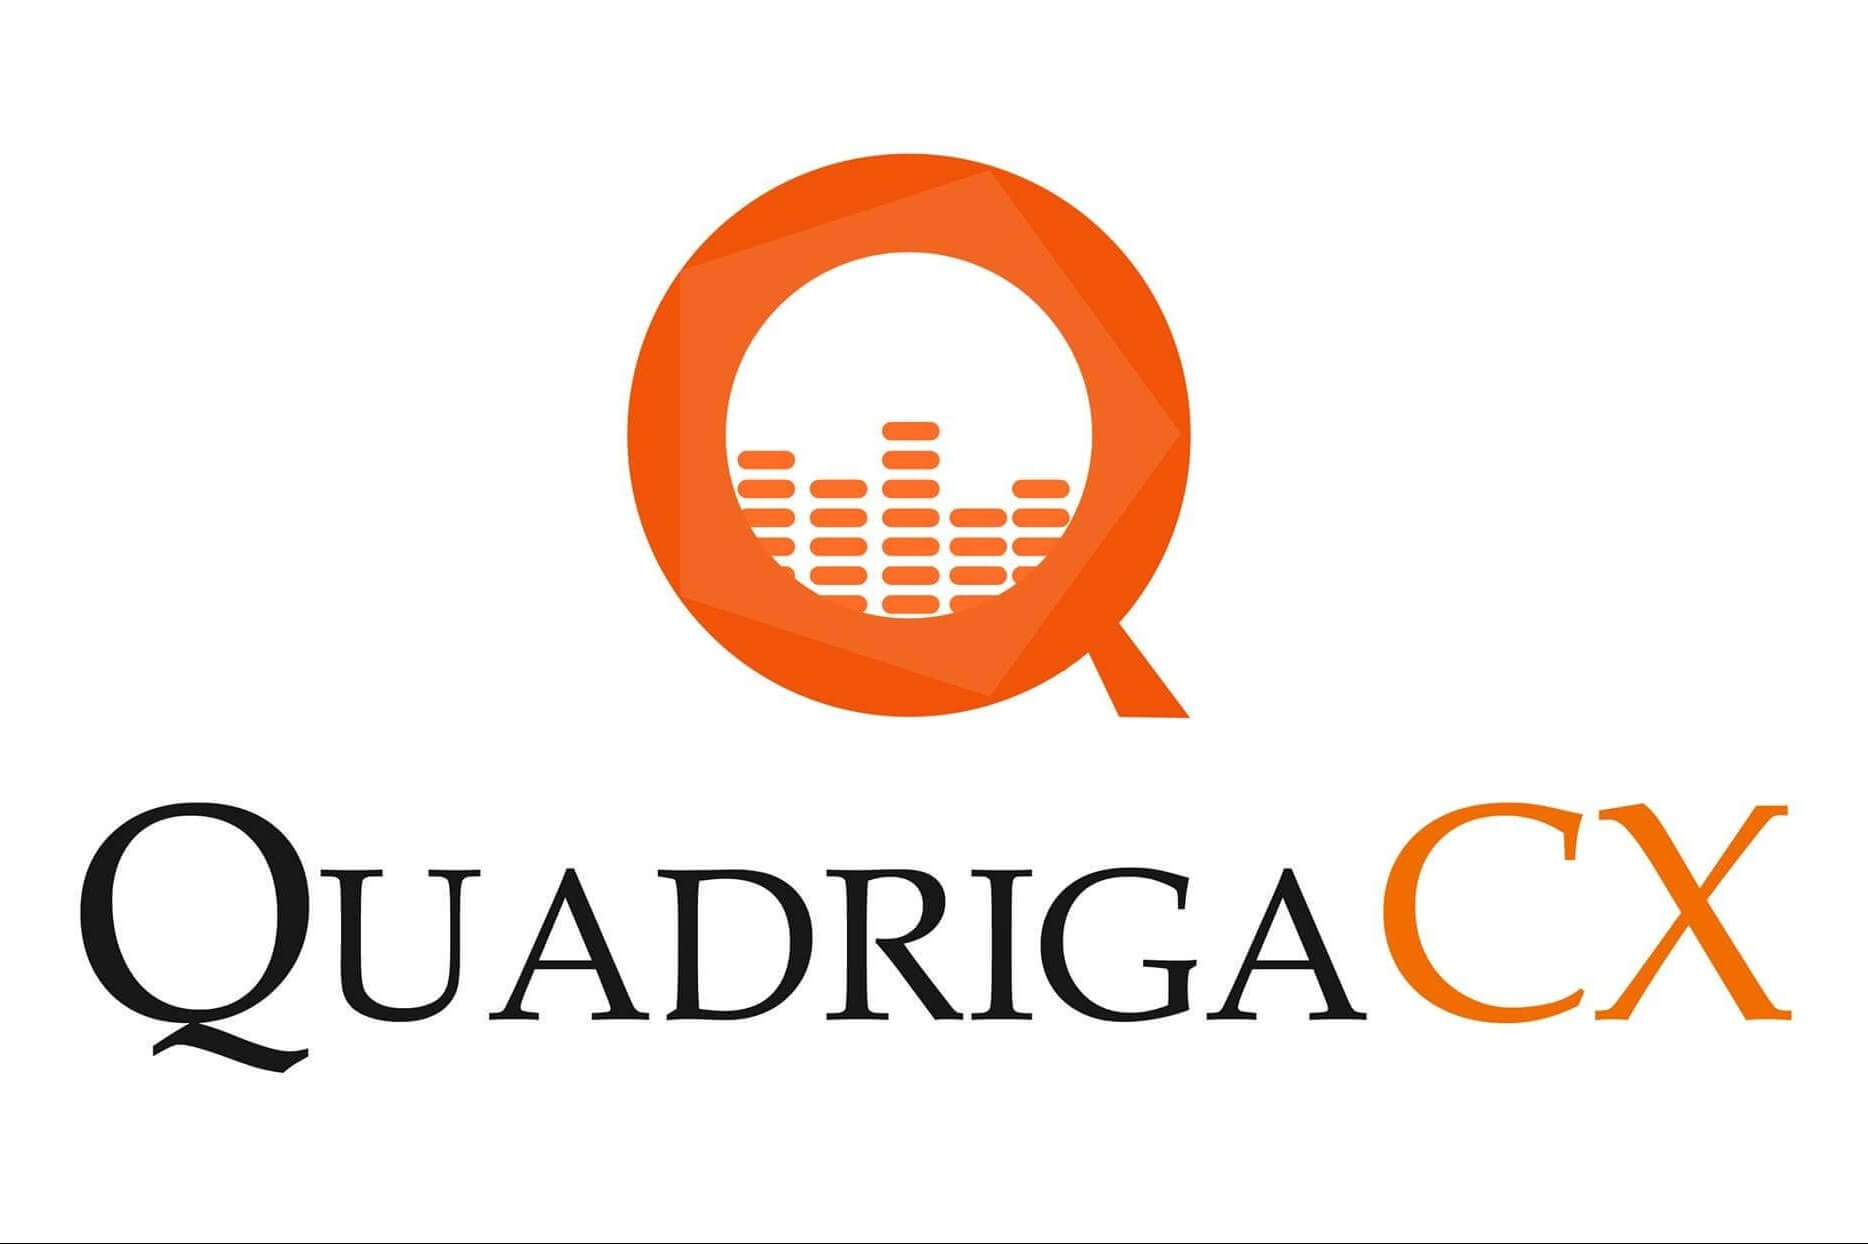 QuadrigaCX Firm